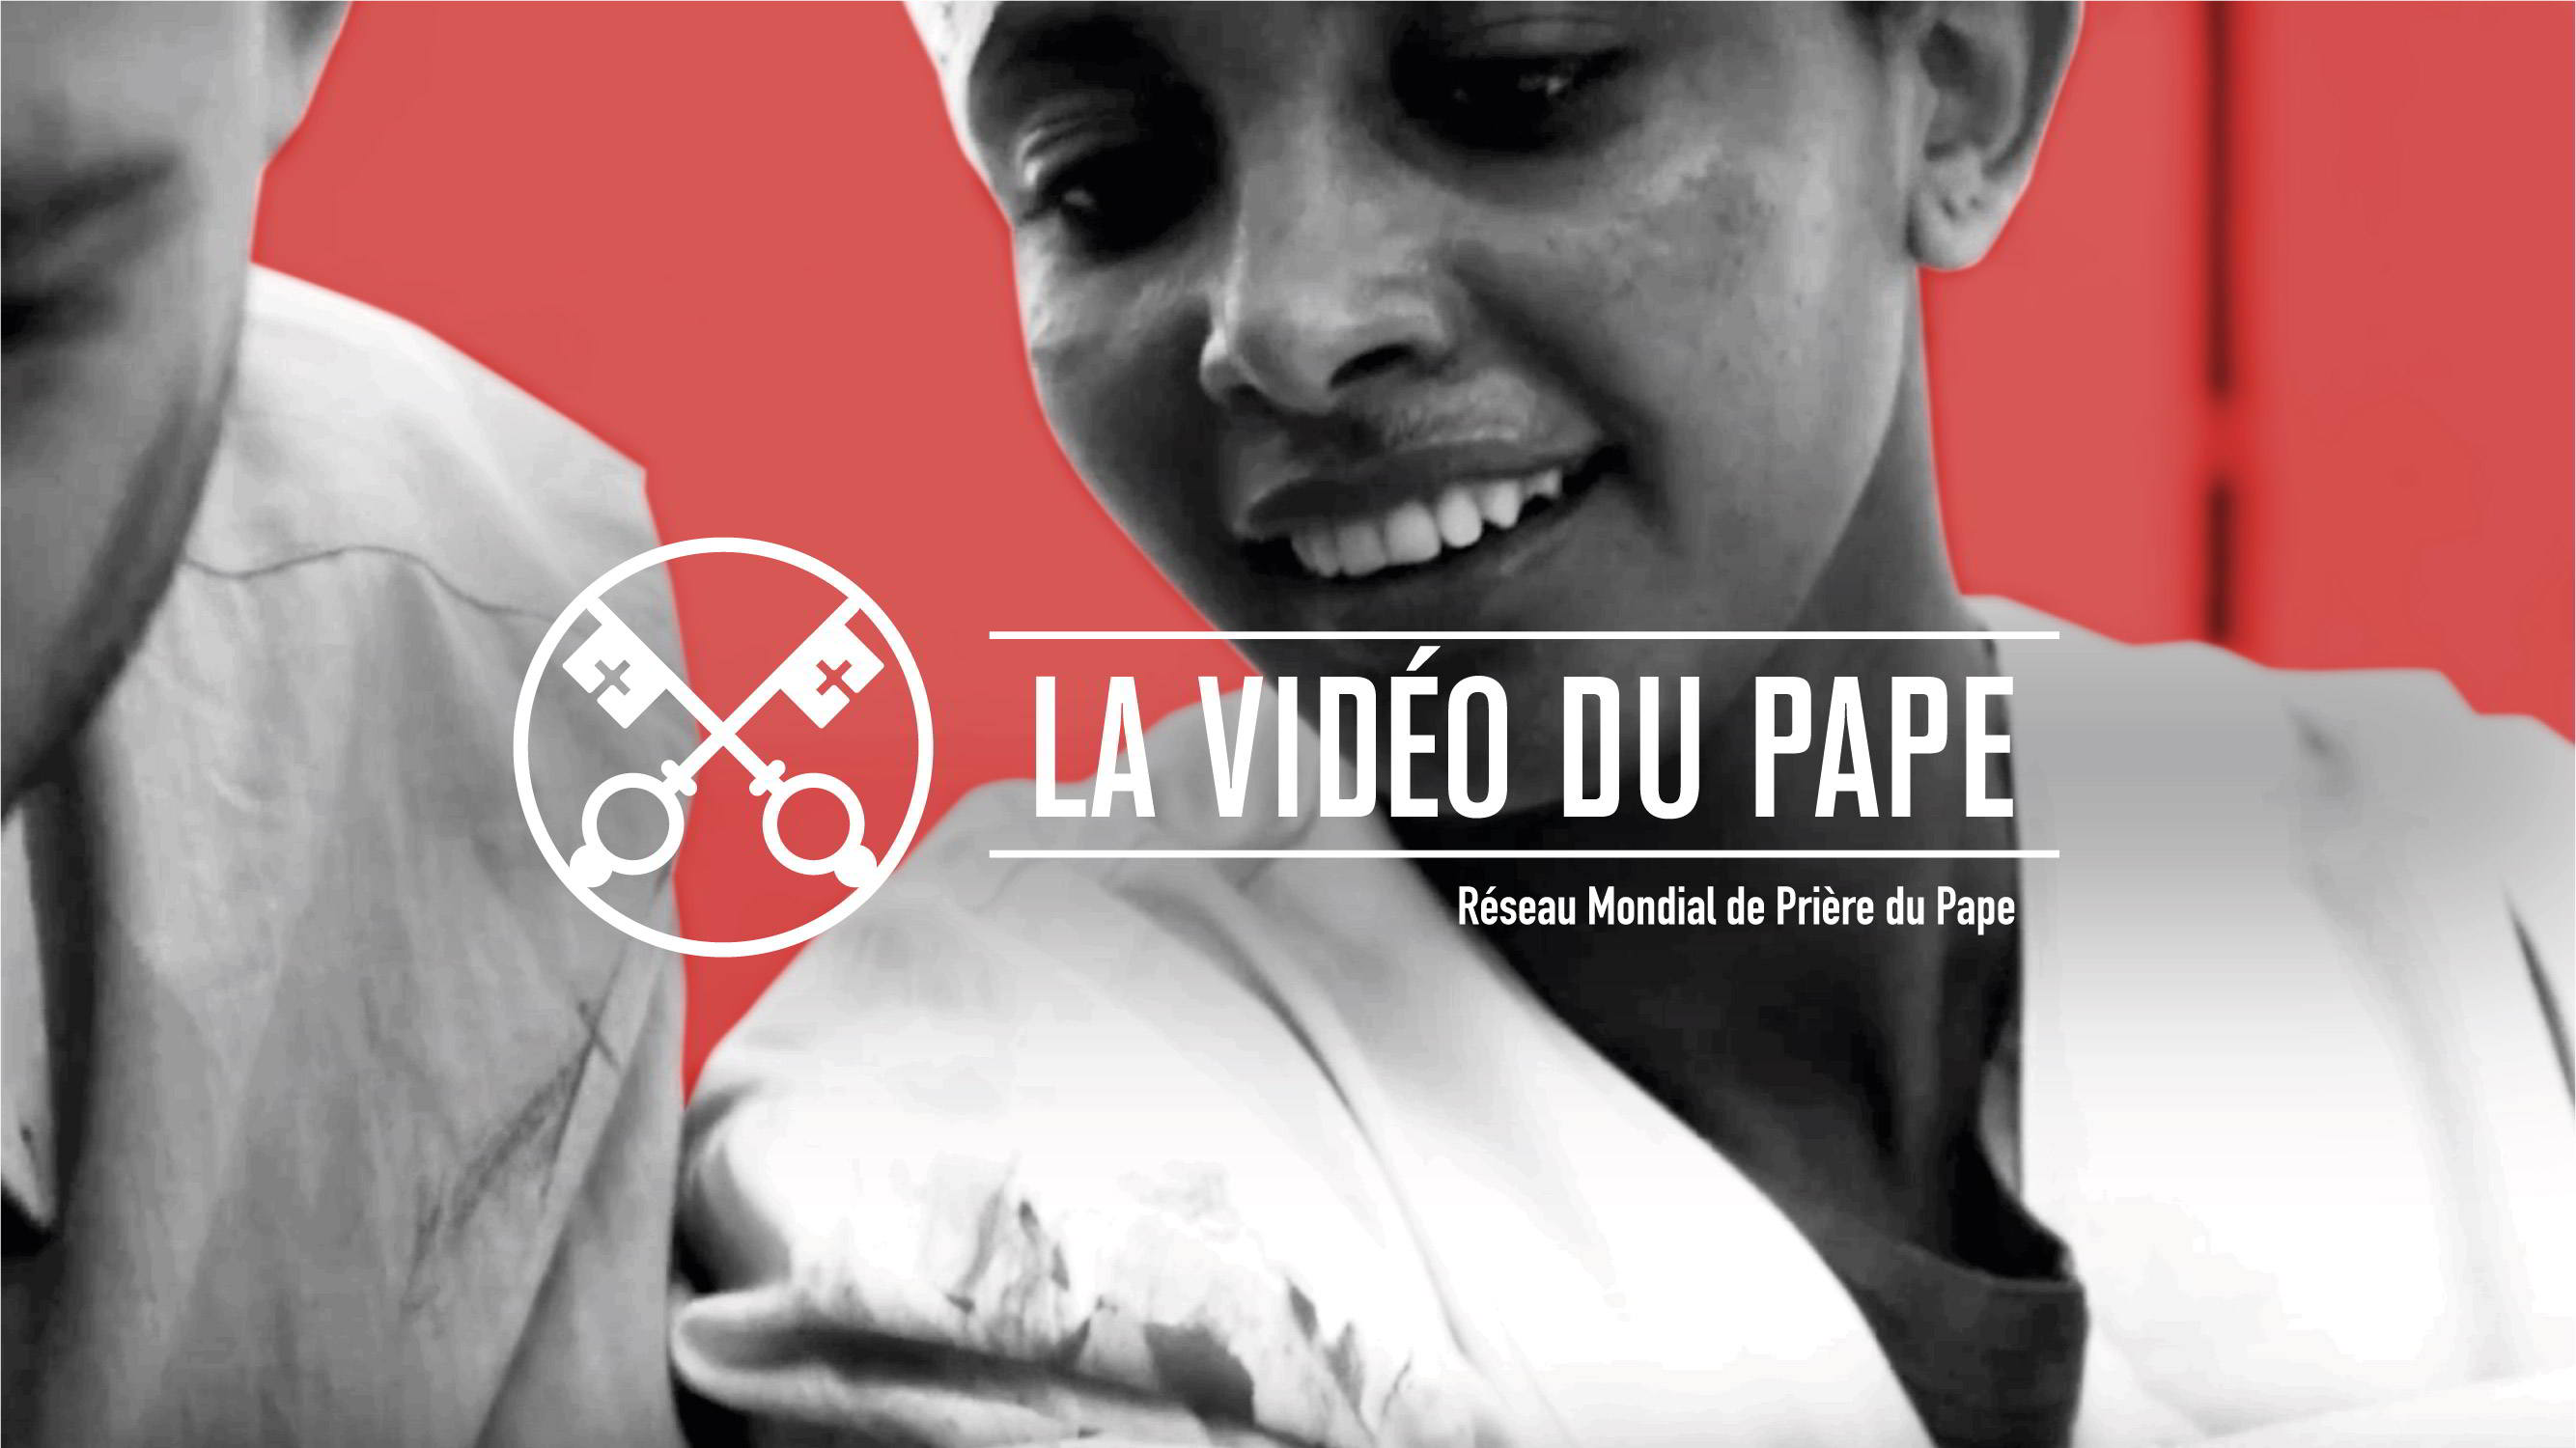 Official-Image-TPV-4-2019-5-FR-Medecins-en-zones-de-combat